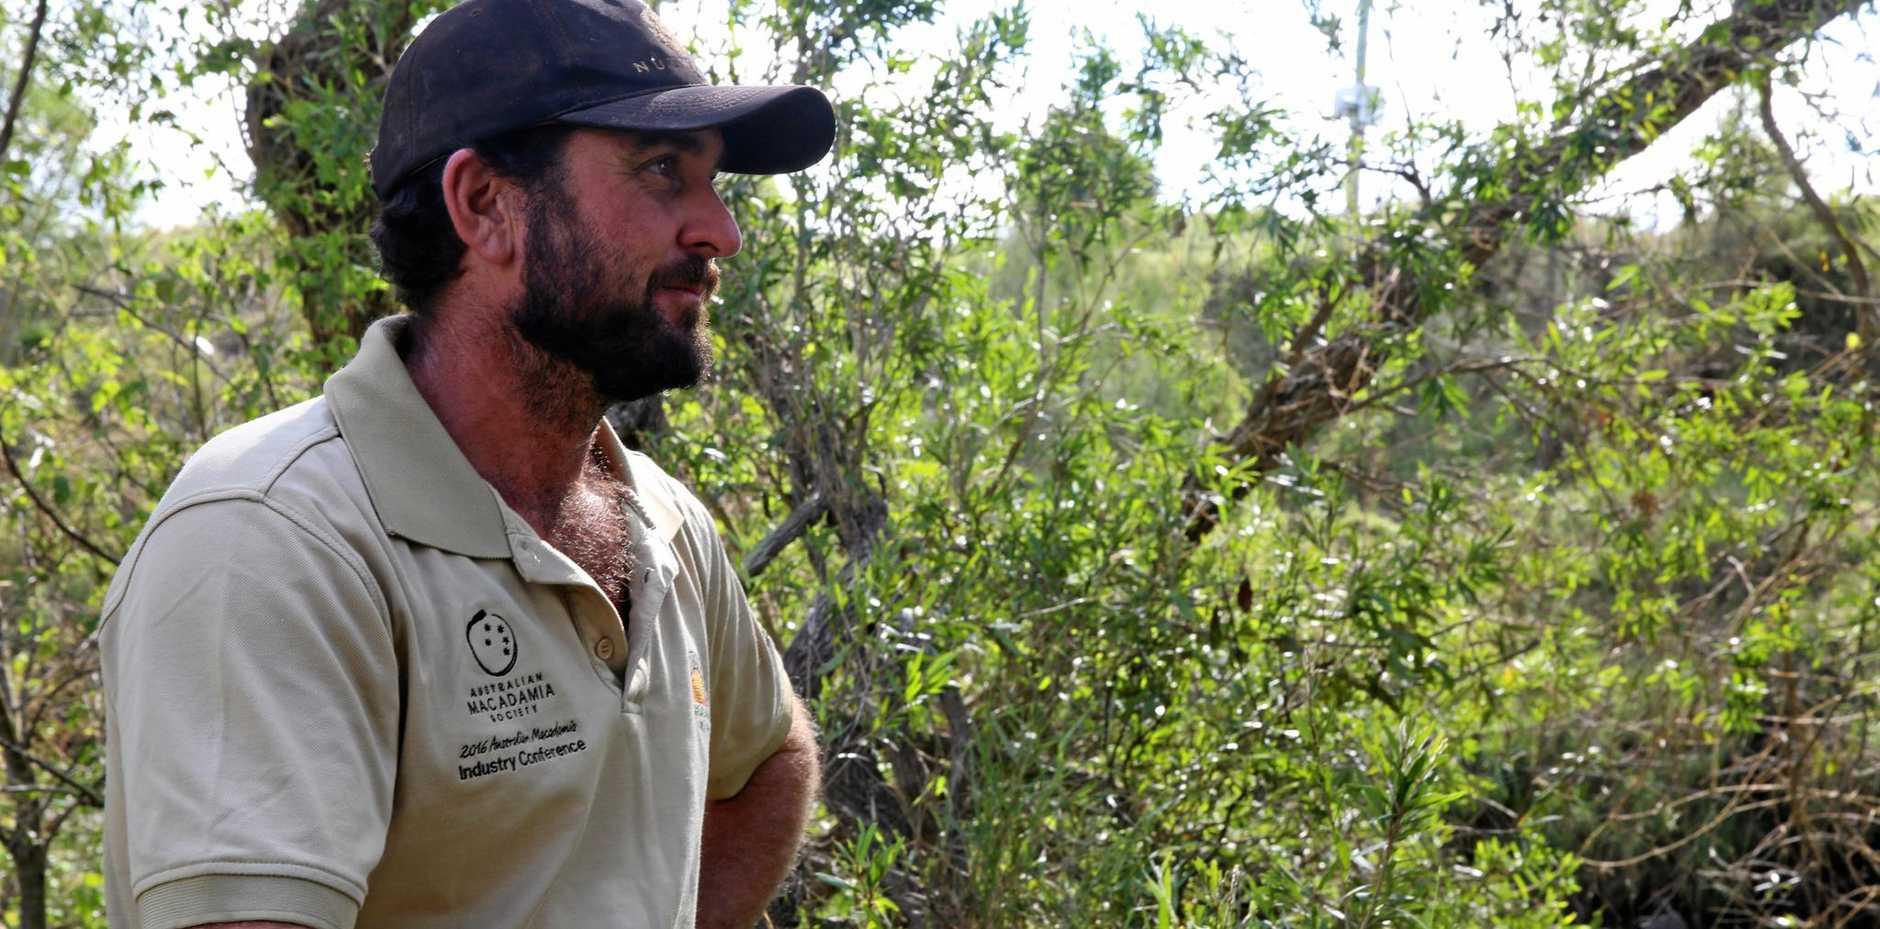 WIDGEE CREEK: James Thomas said the Widgee Creek on Jensen Rd flowed well over the bridge near his macadamia farm.